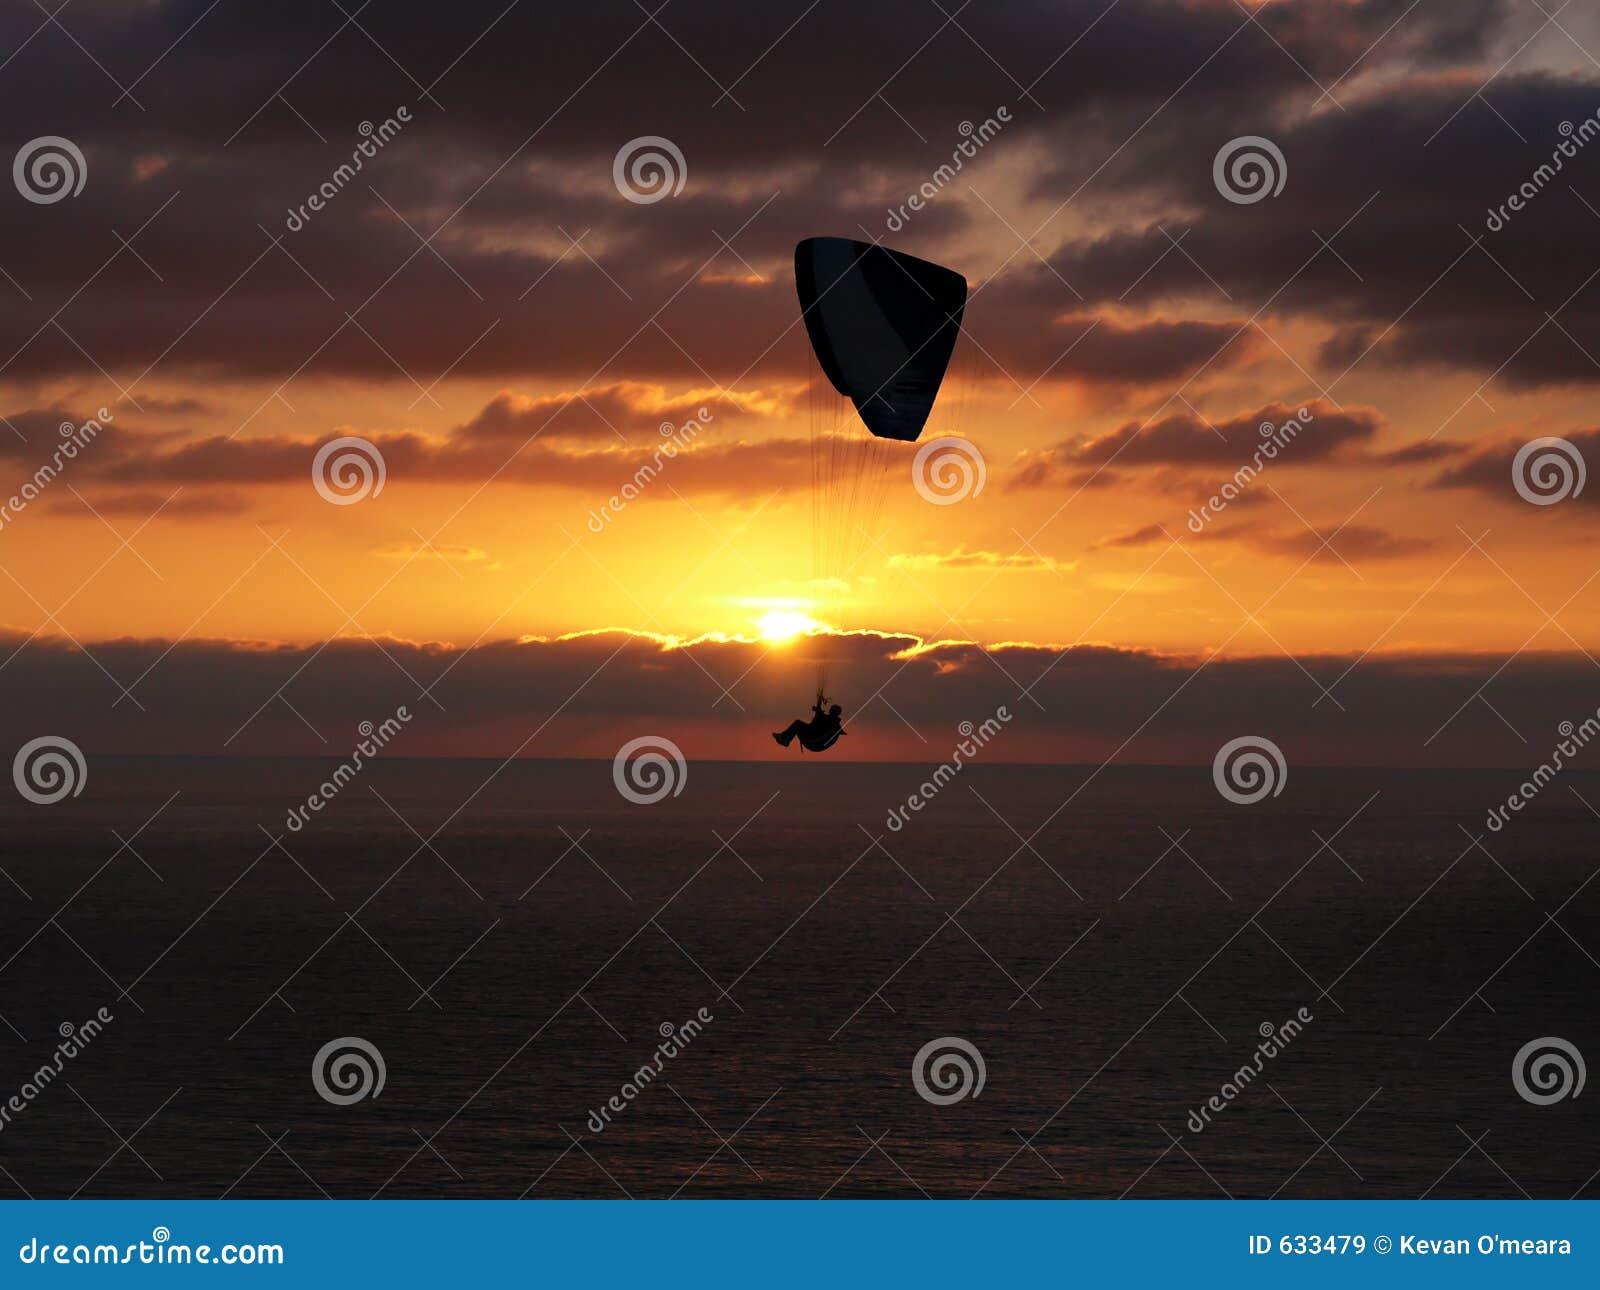 Download далекий заход солнца Hang планера Стоковое Изображение - изображение насчитывающей напольно, california: 633479